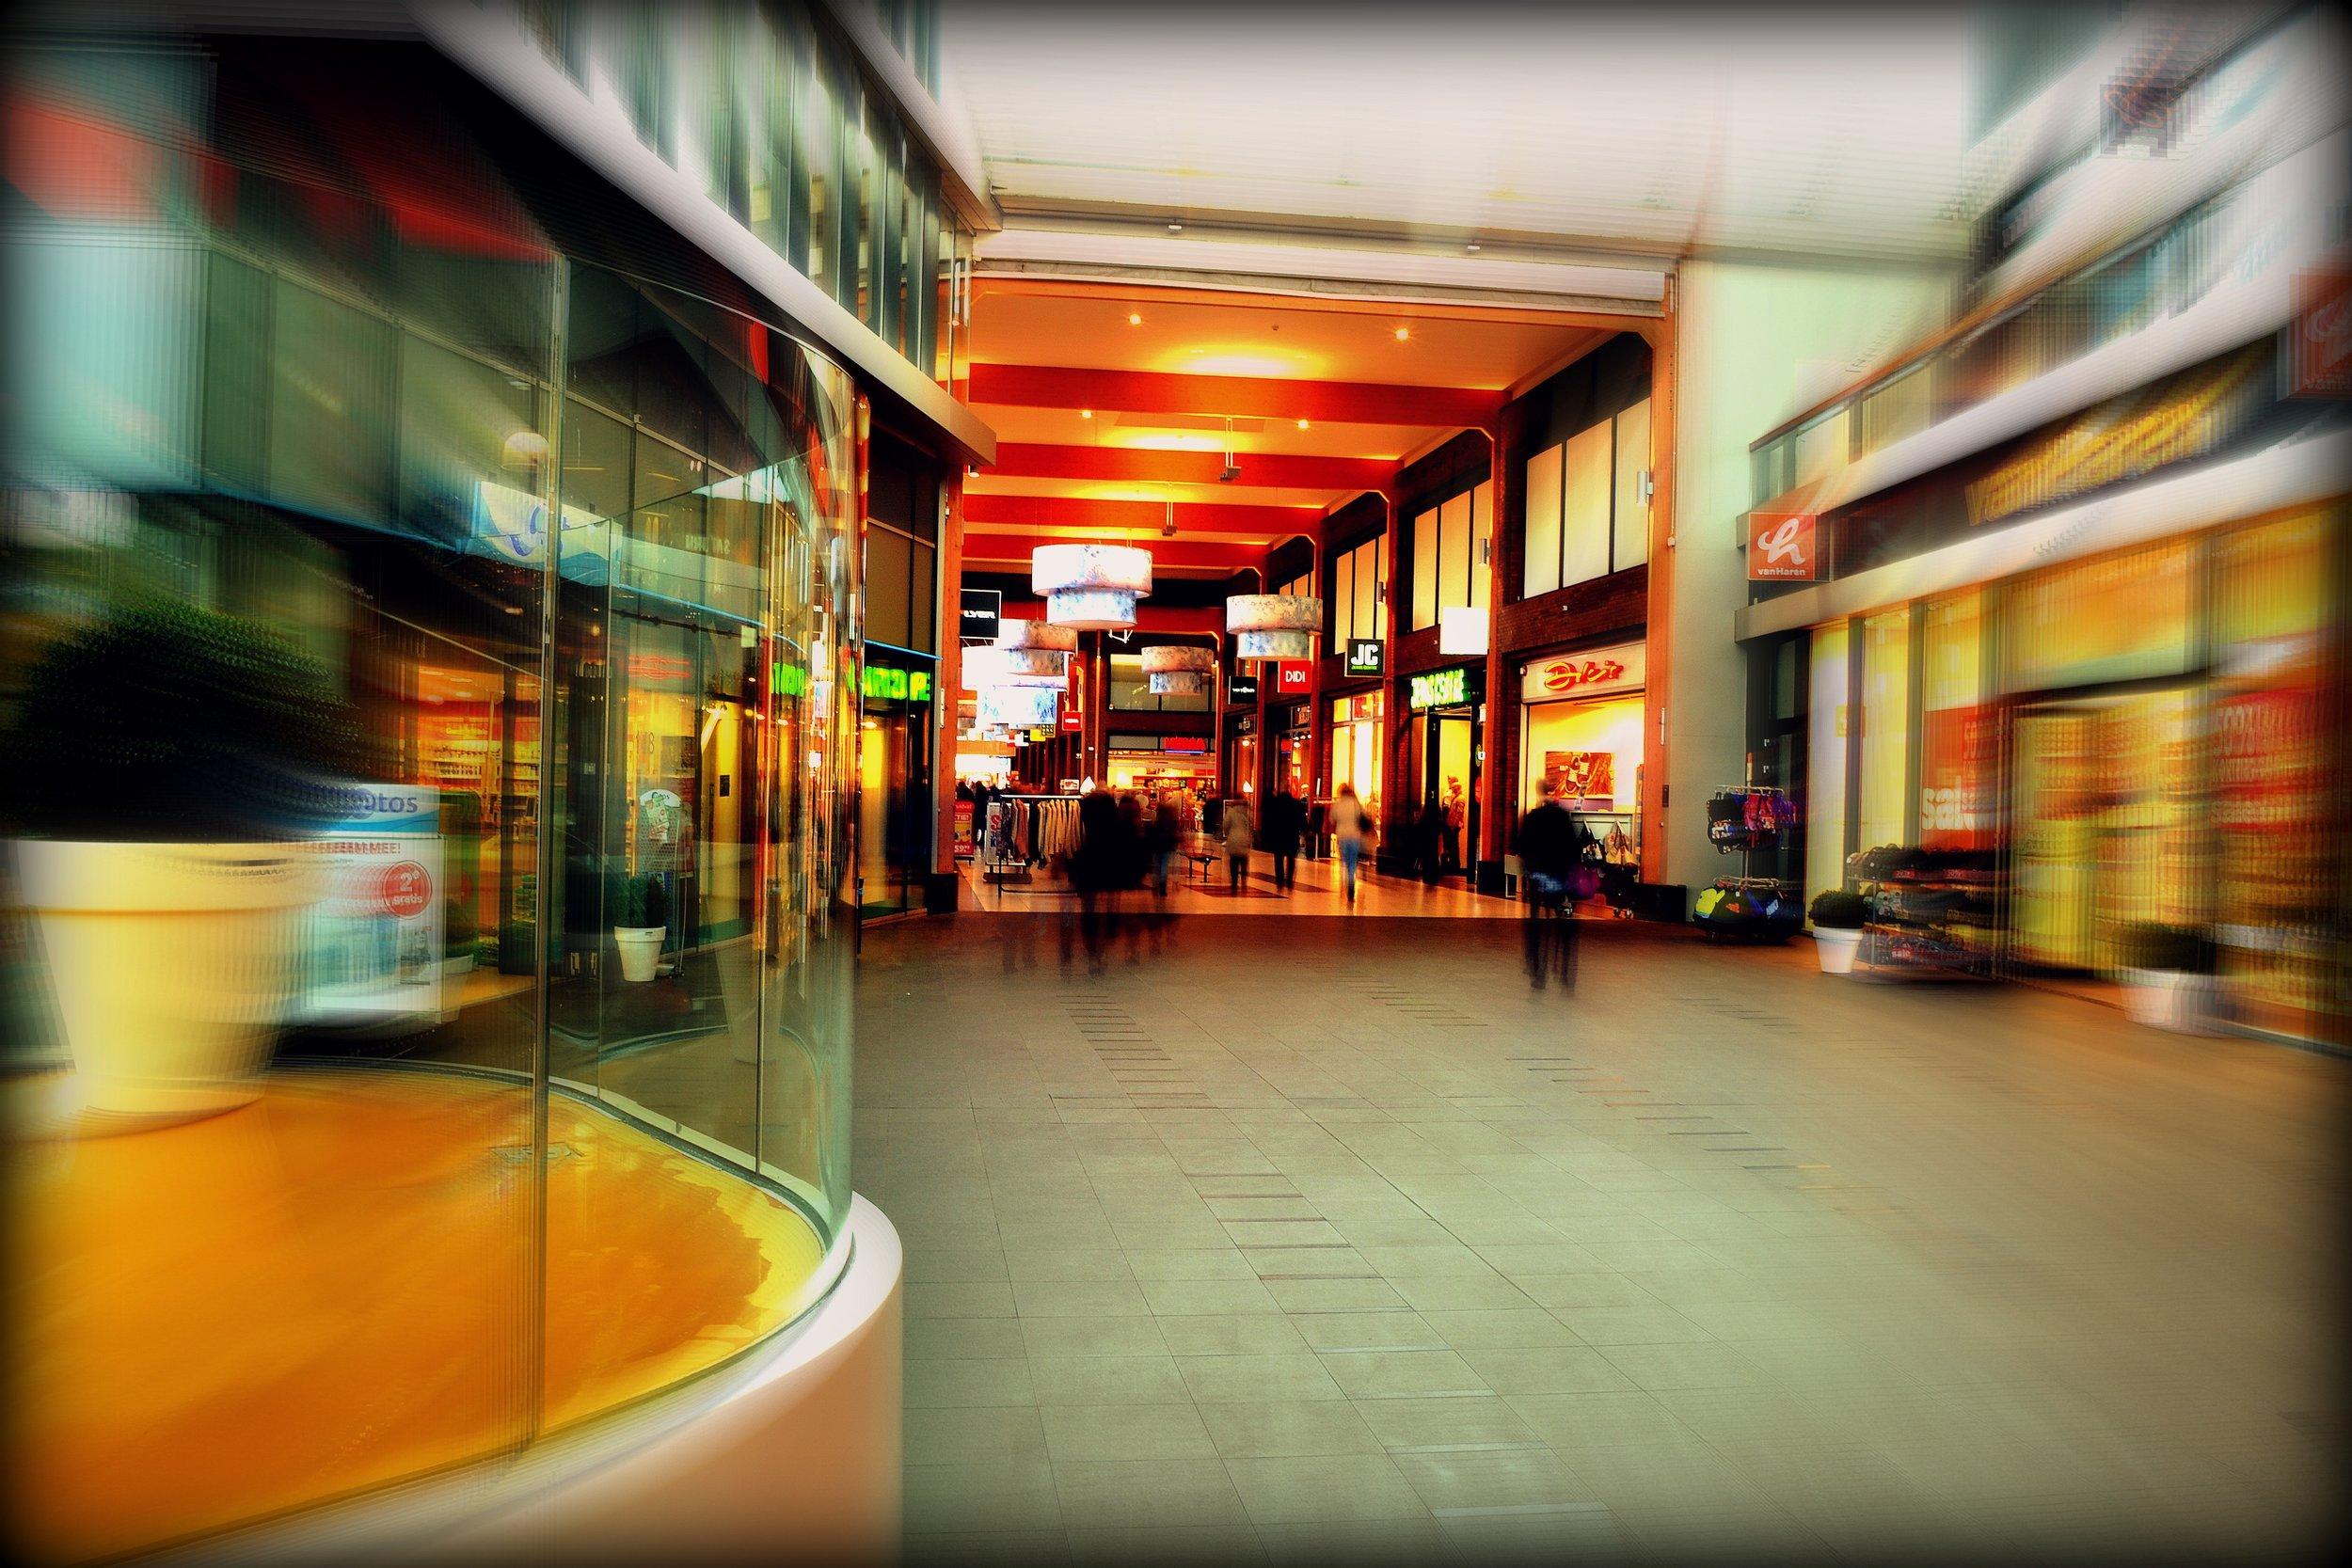 architecture-blur-building-449559.jpg